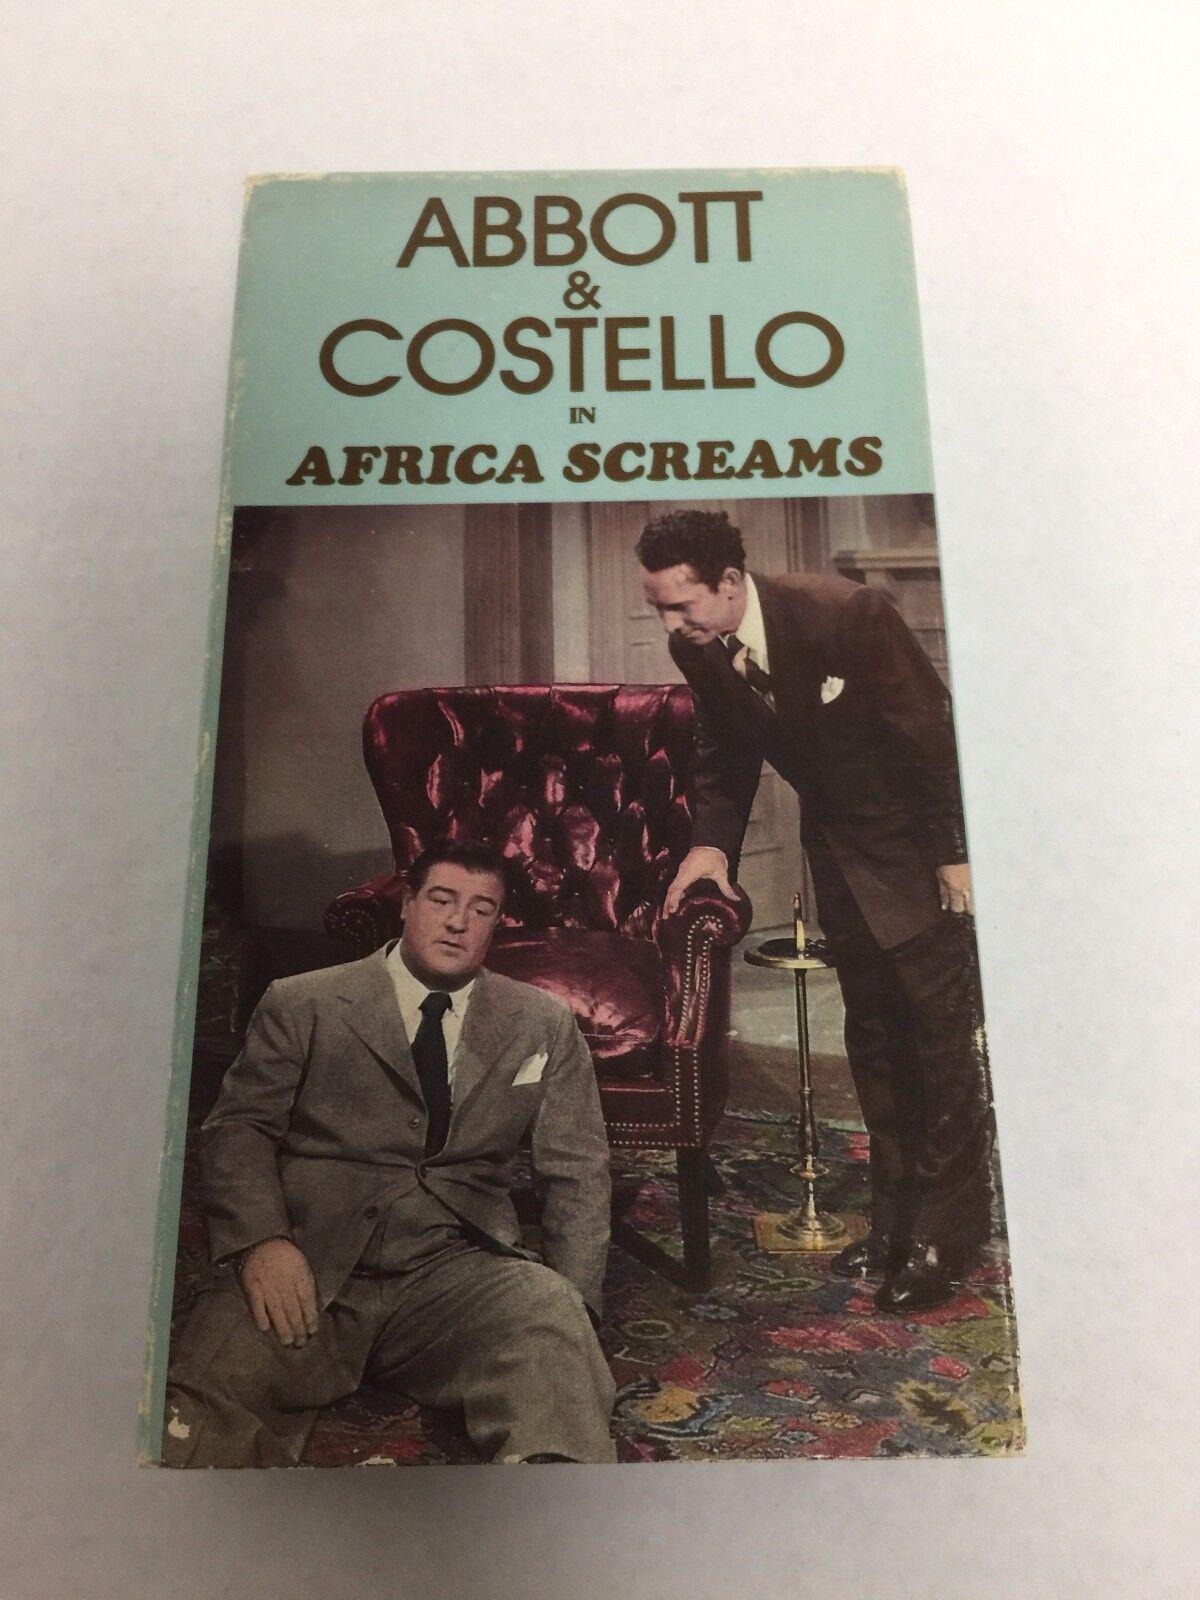 Abbott & Costello: Africa Screams VHS